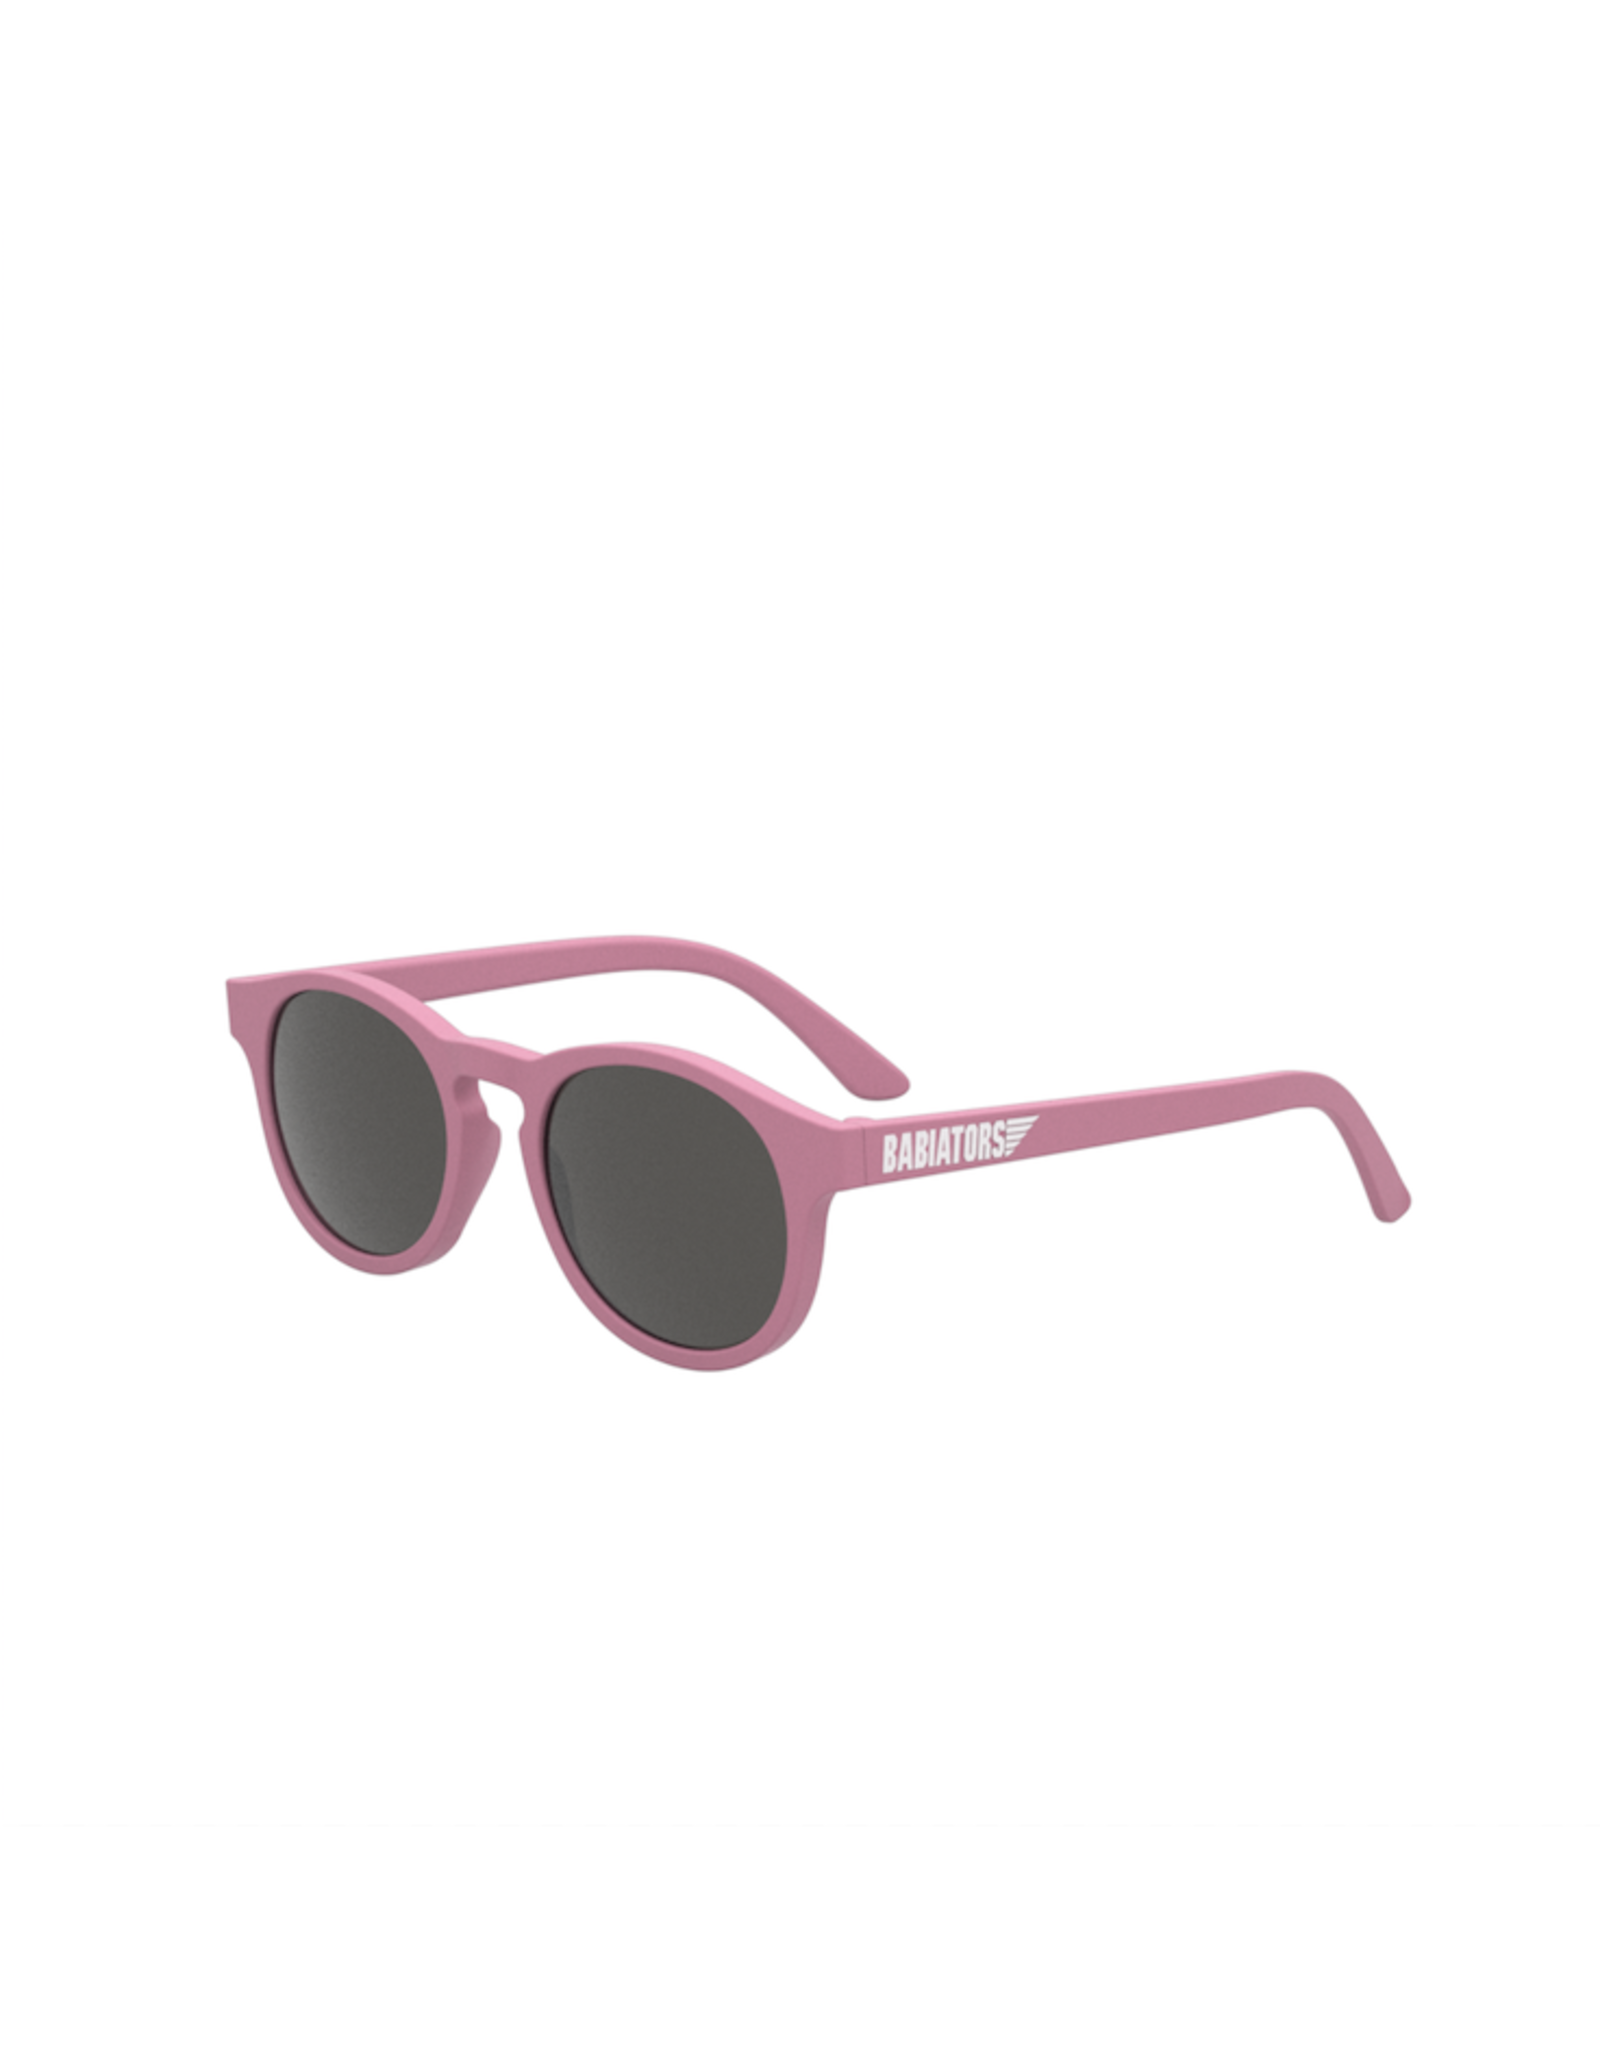 Babiators Limited Edition, SweetHeart, Navigator Sunglasses